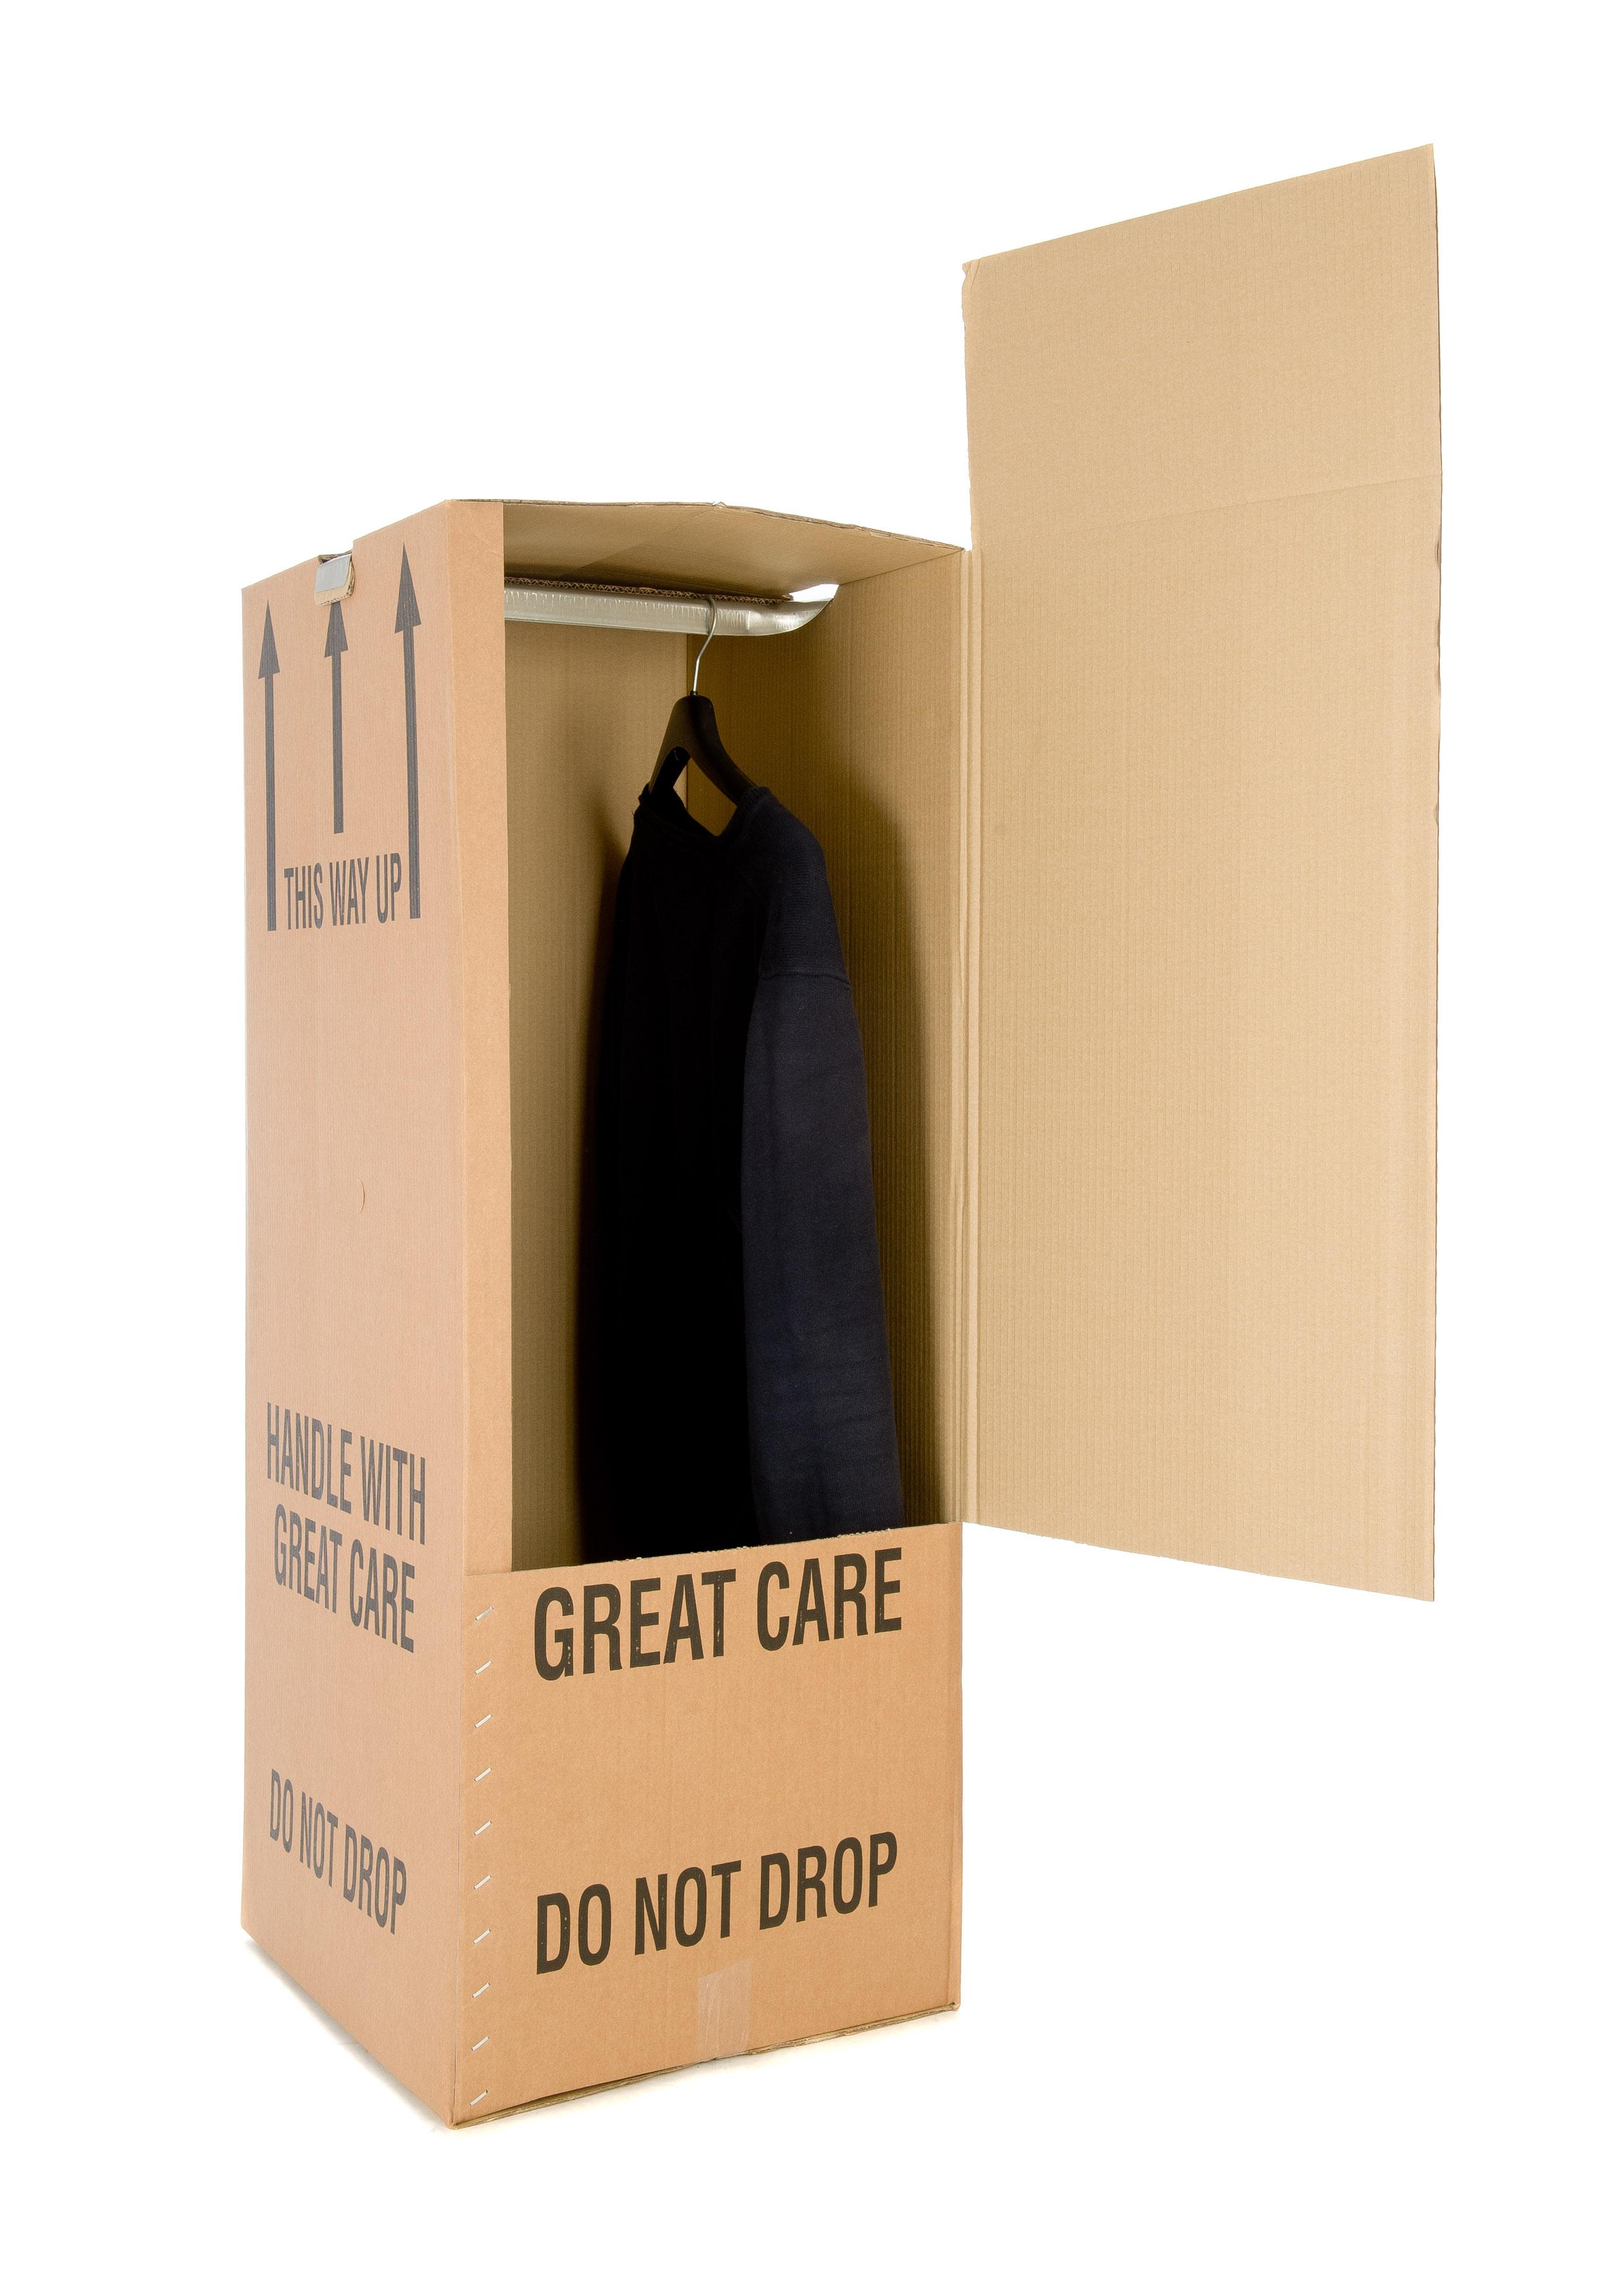 box moving inc movingstorage supplies htm shipping storage wardrobe pathe boxes sampler company